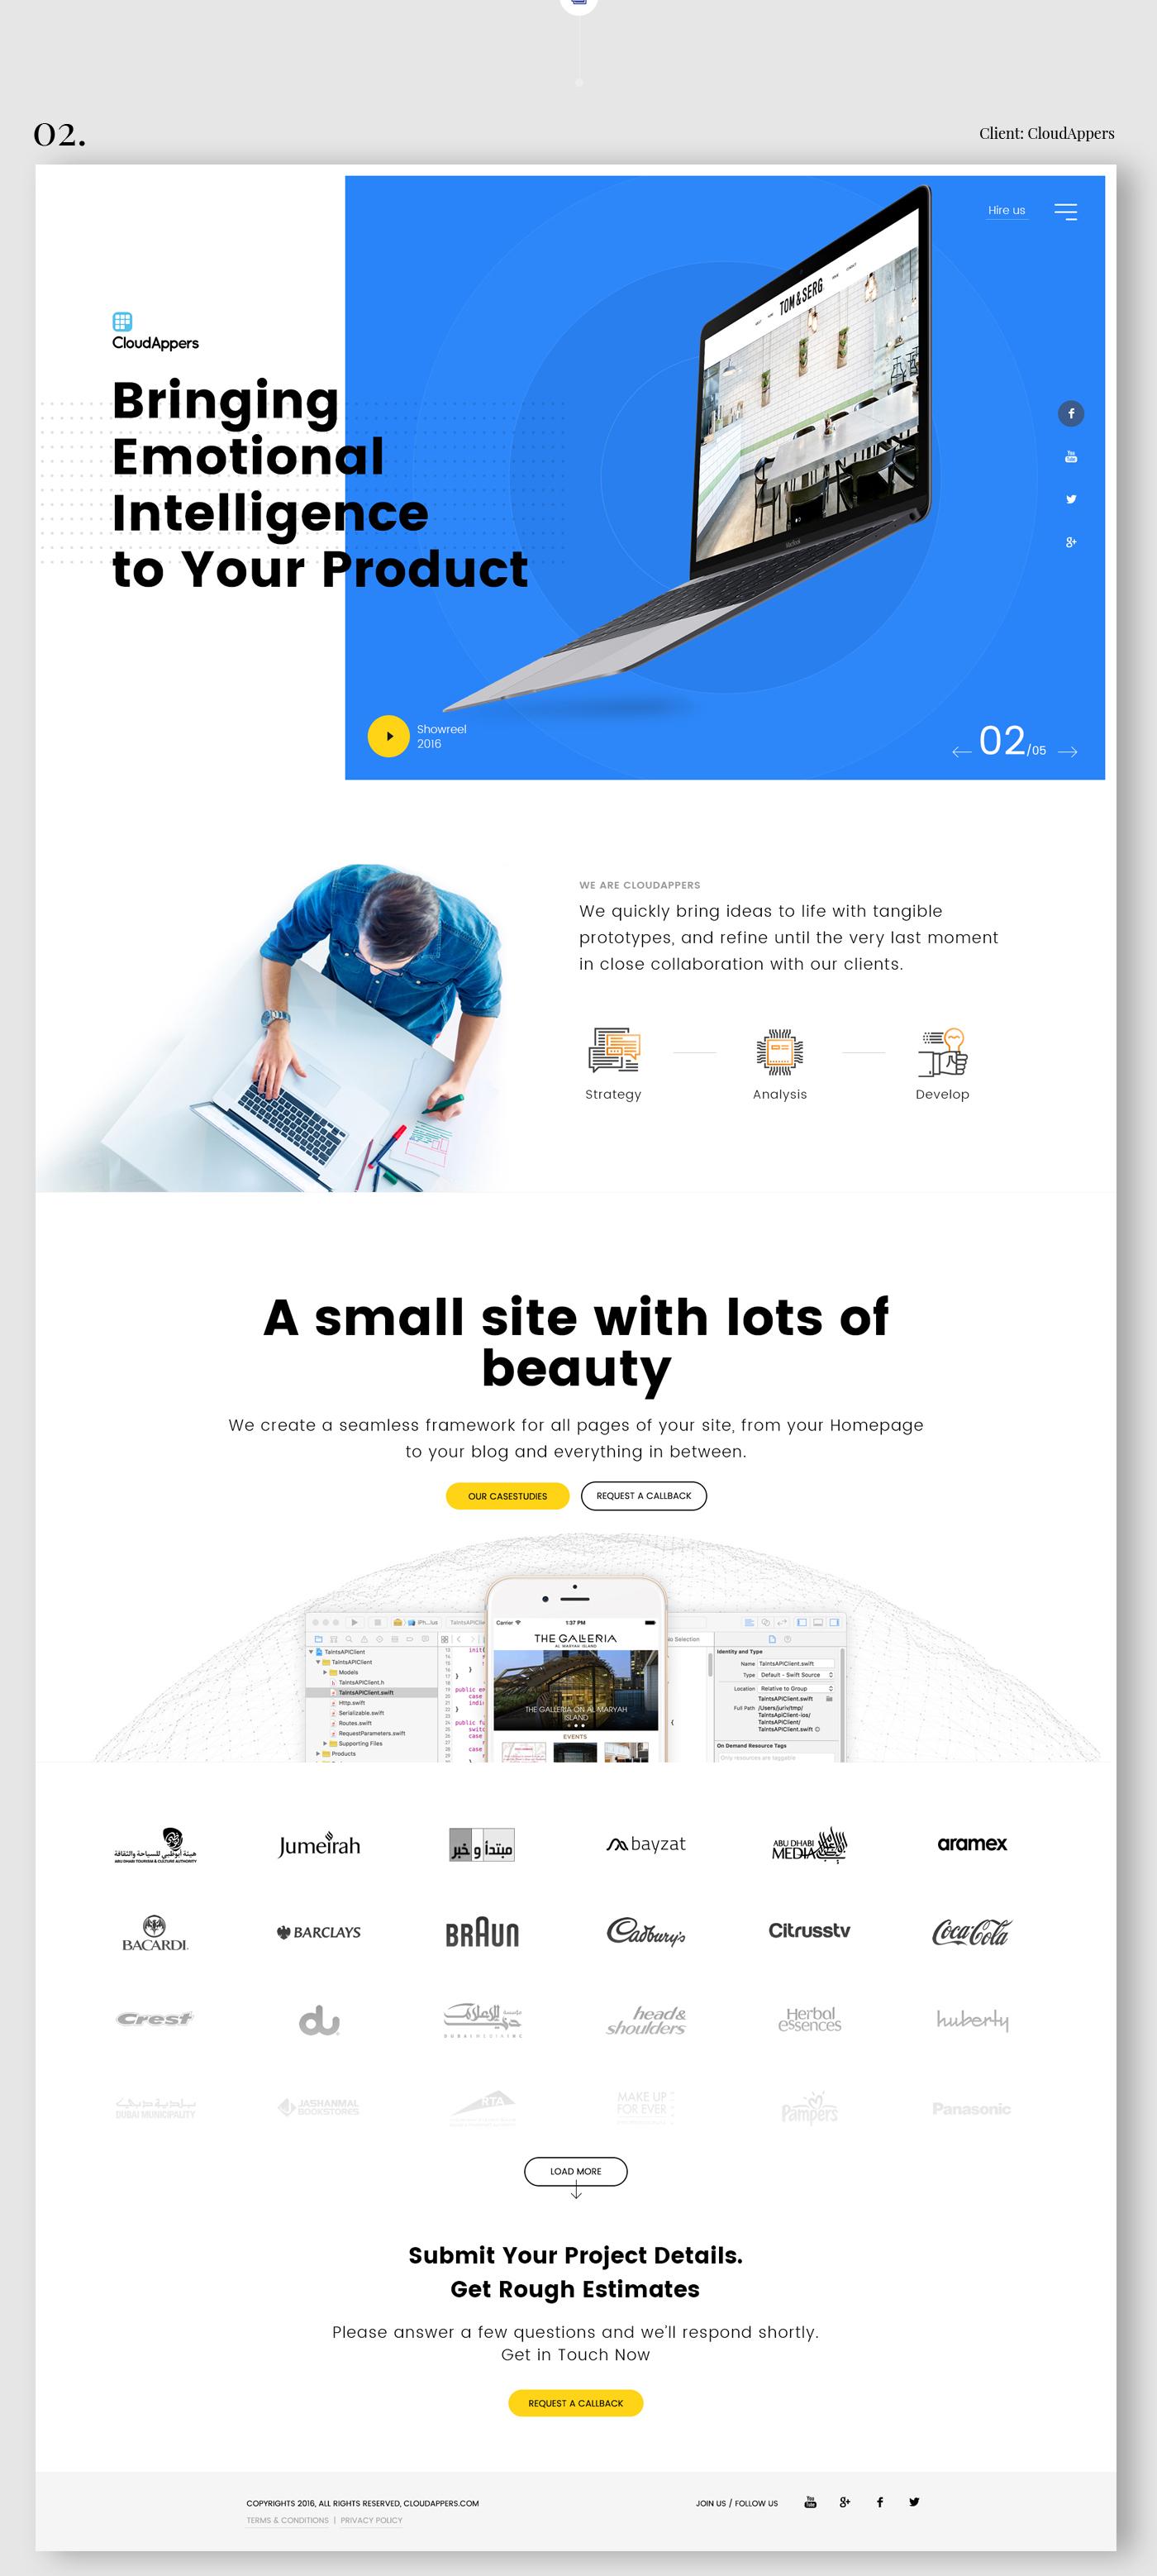 Collection,2016webdesign,pixel,pixelzeesh,UI,ux,WebInterface,Interface,interaction,graphics